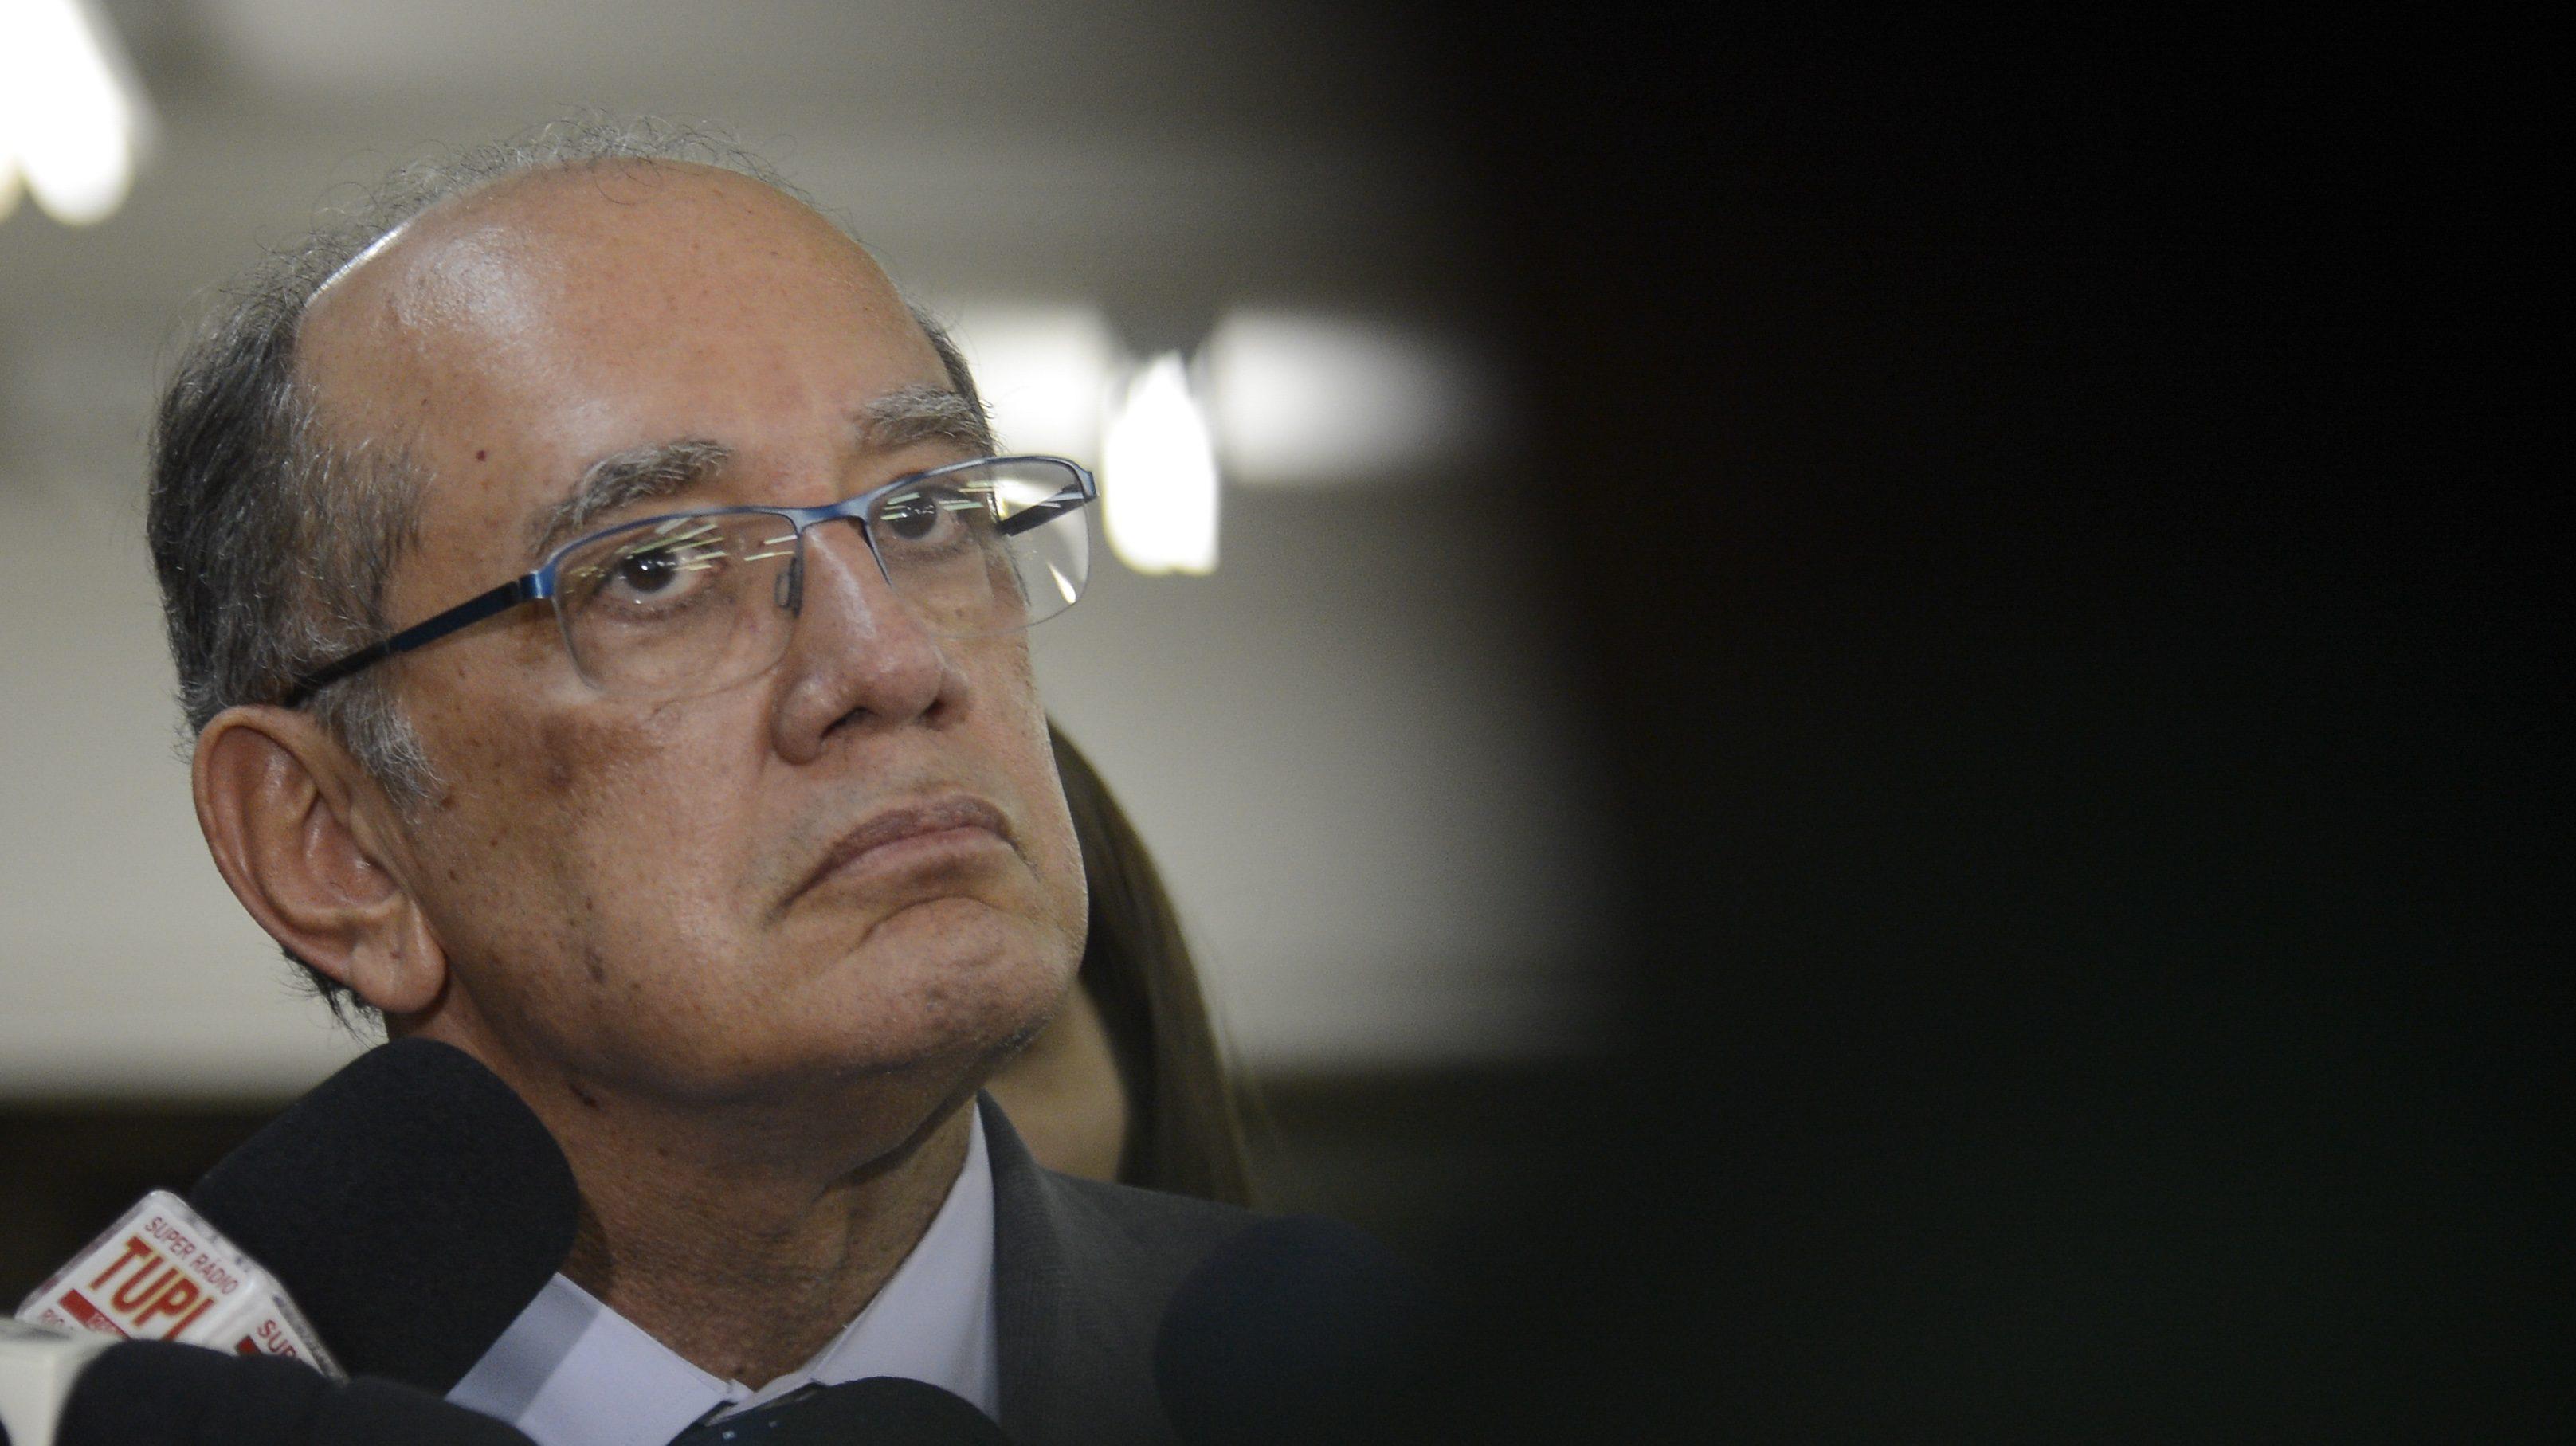 IMAGEM: Presidente analisa o pré-veto na indicação ao STF, afirma Gilmar